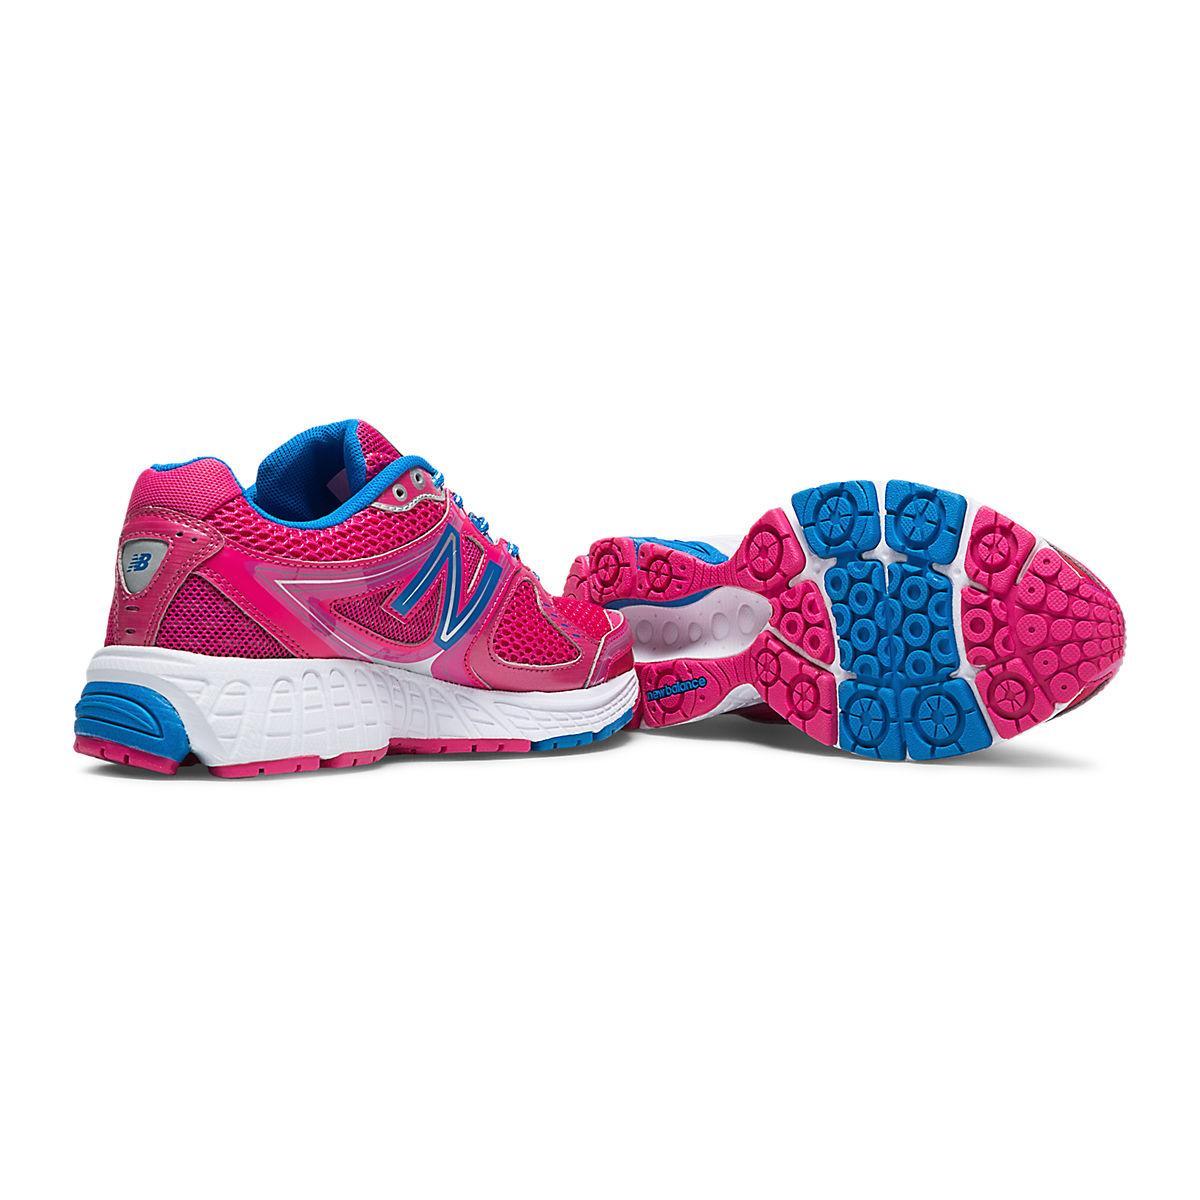 new balance w680v3 womens b running shoes pink blue